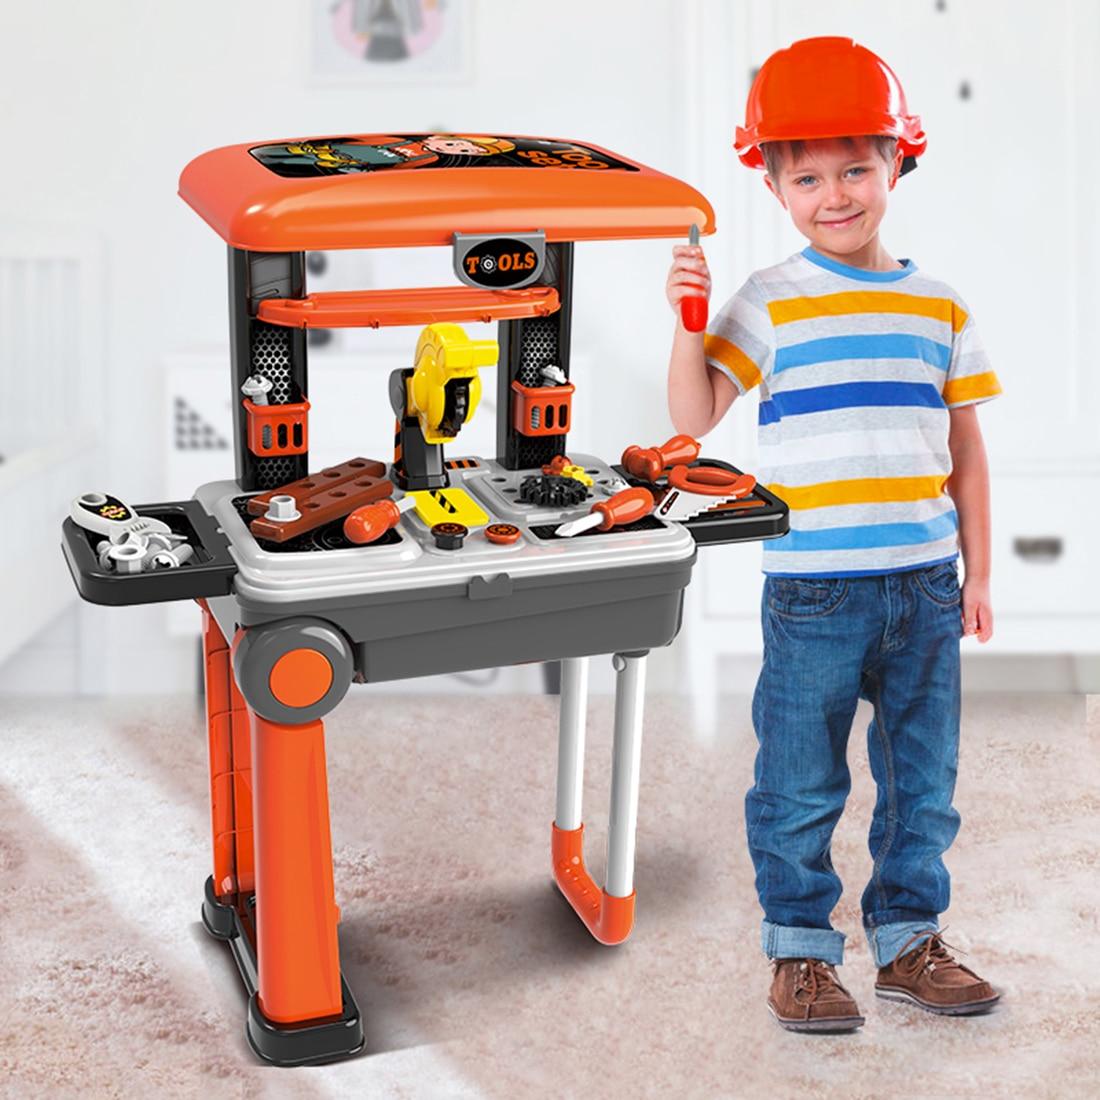 цены на Children Repair Tool Toys Set ABS Workshop Playset Kids Parents Interactive Educational Gift Toys For Kid -Orange  в интернет-магазинах